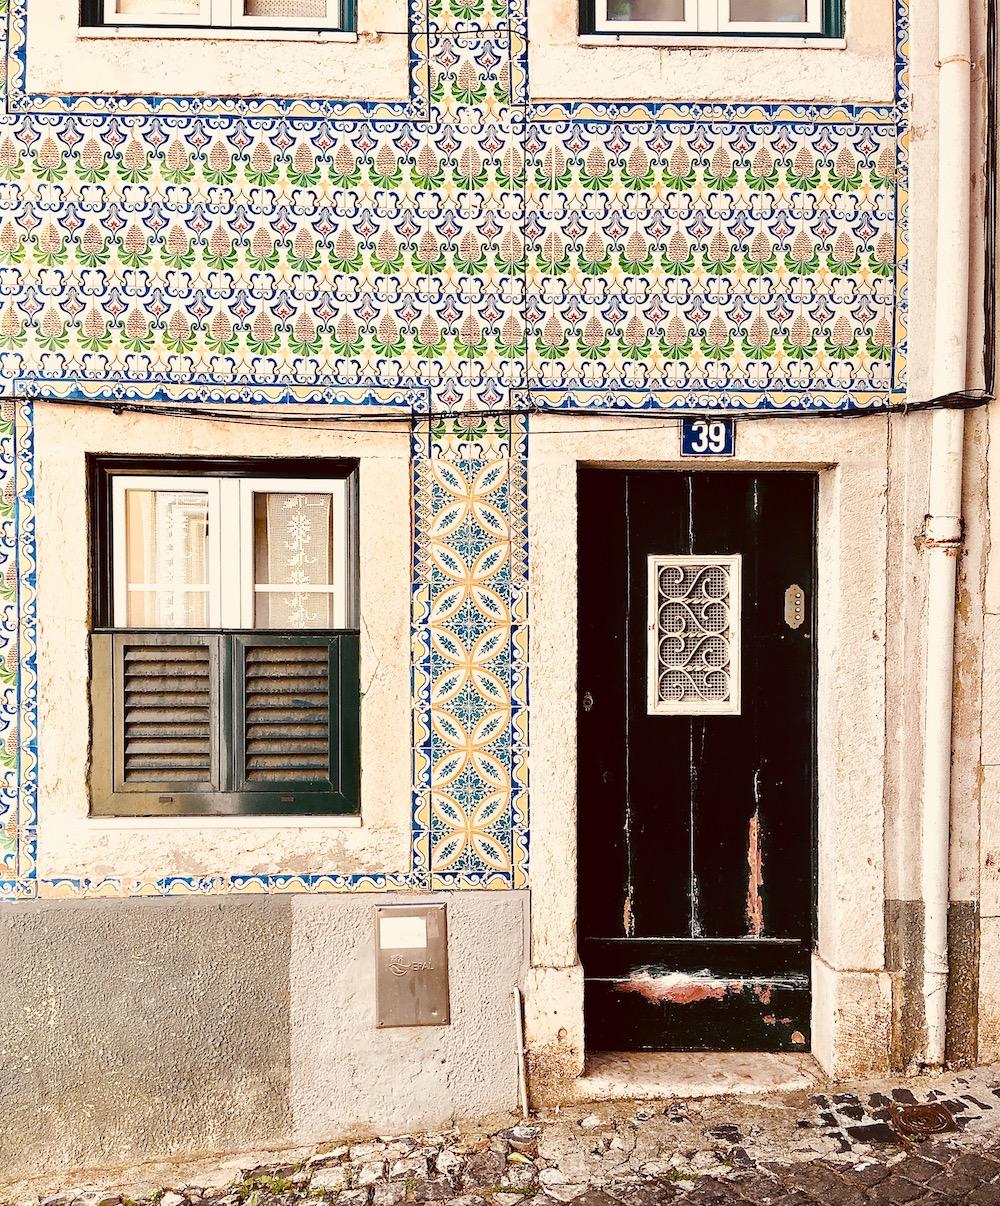 Lisbon_life_of_faorytales_10.jpg